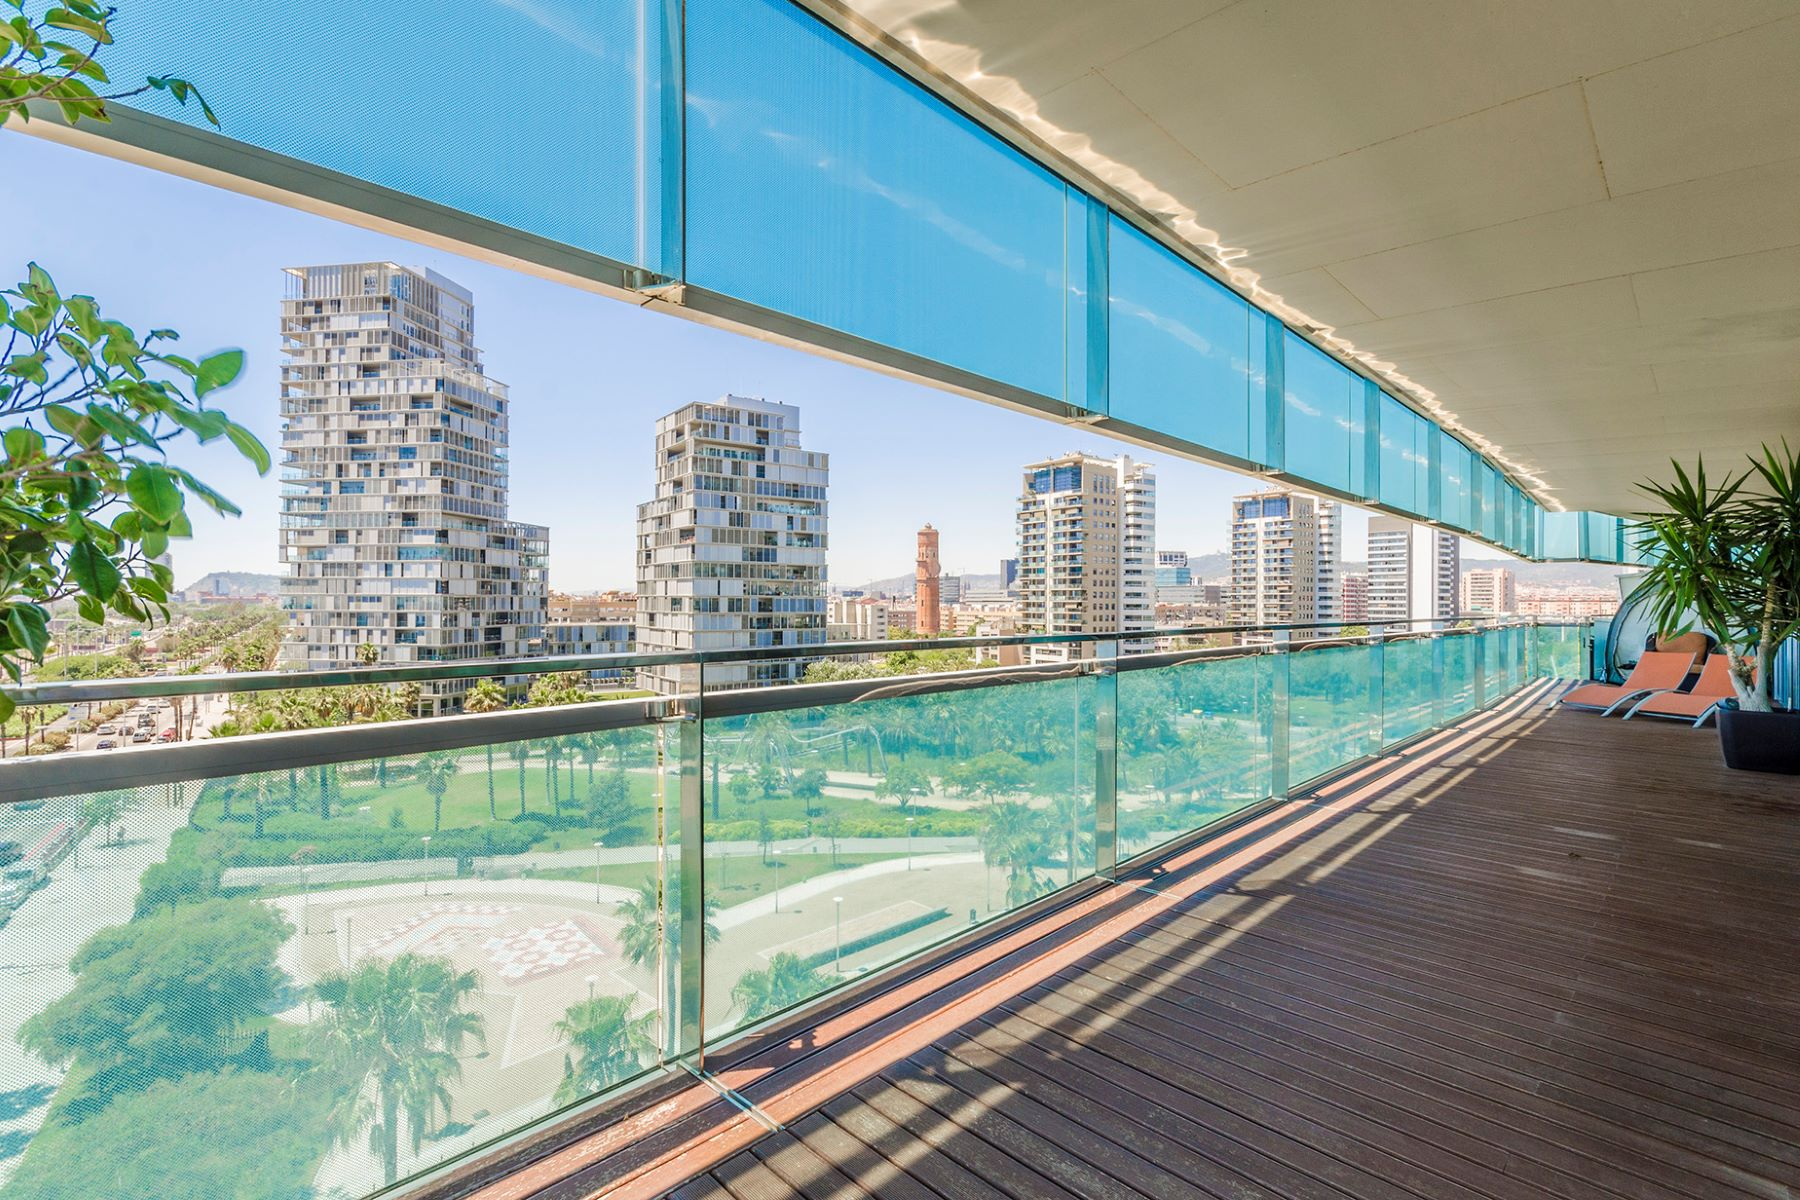 Apartment for Sale at Apartment in Illa de Mar, Barcelona Barcelona City, Barcelona, 08019 Spain